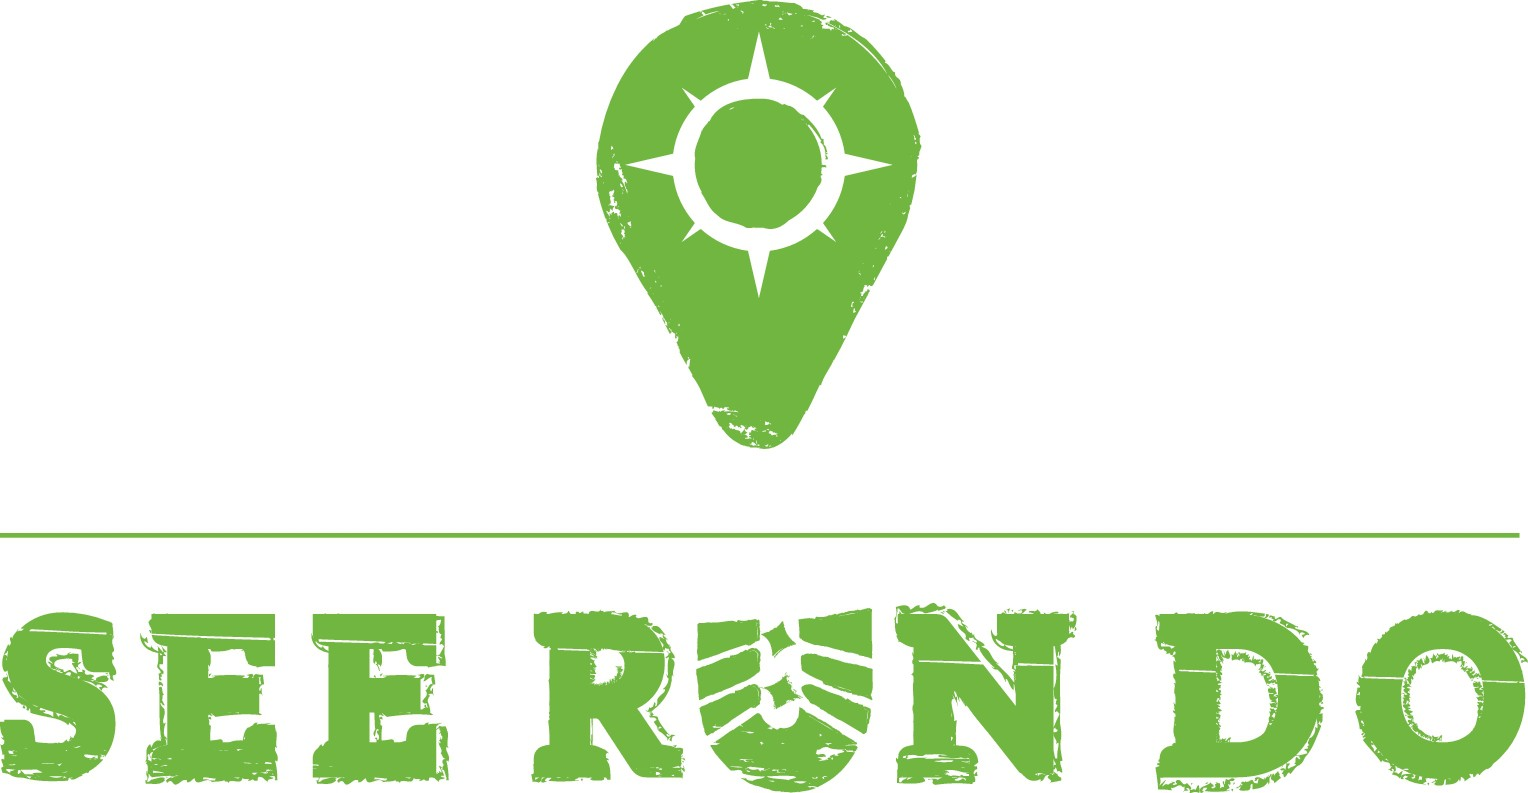 NEW Around the World Travel Blog - Create  cool, fun logo for my new blog